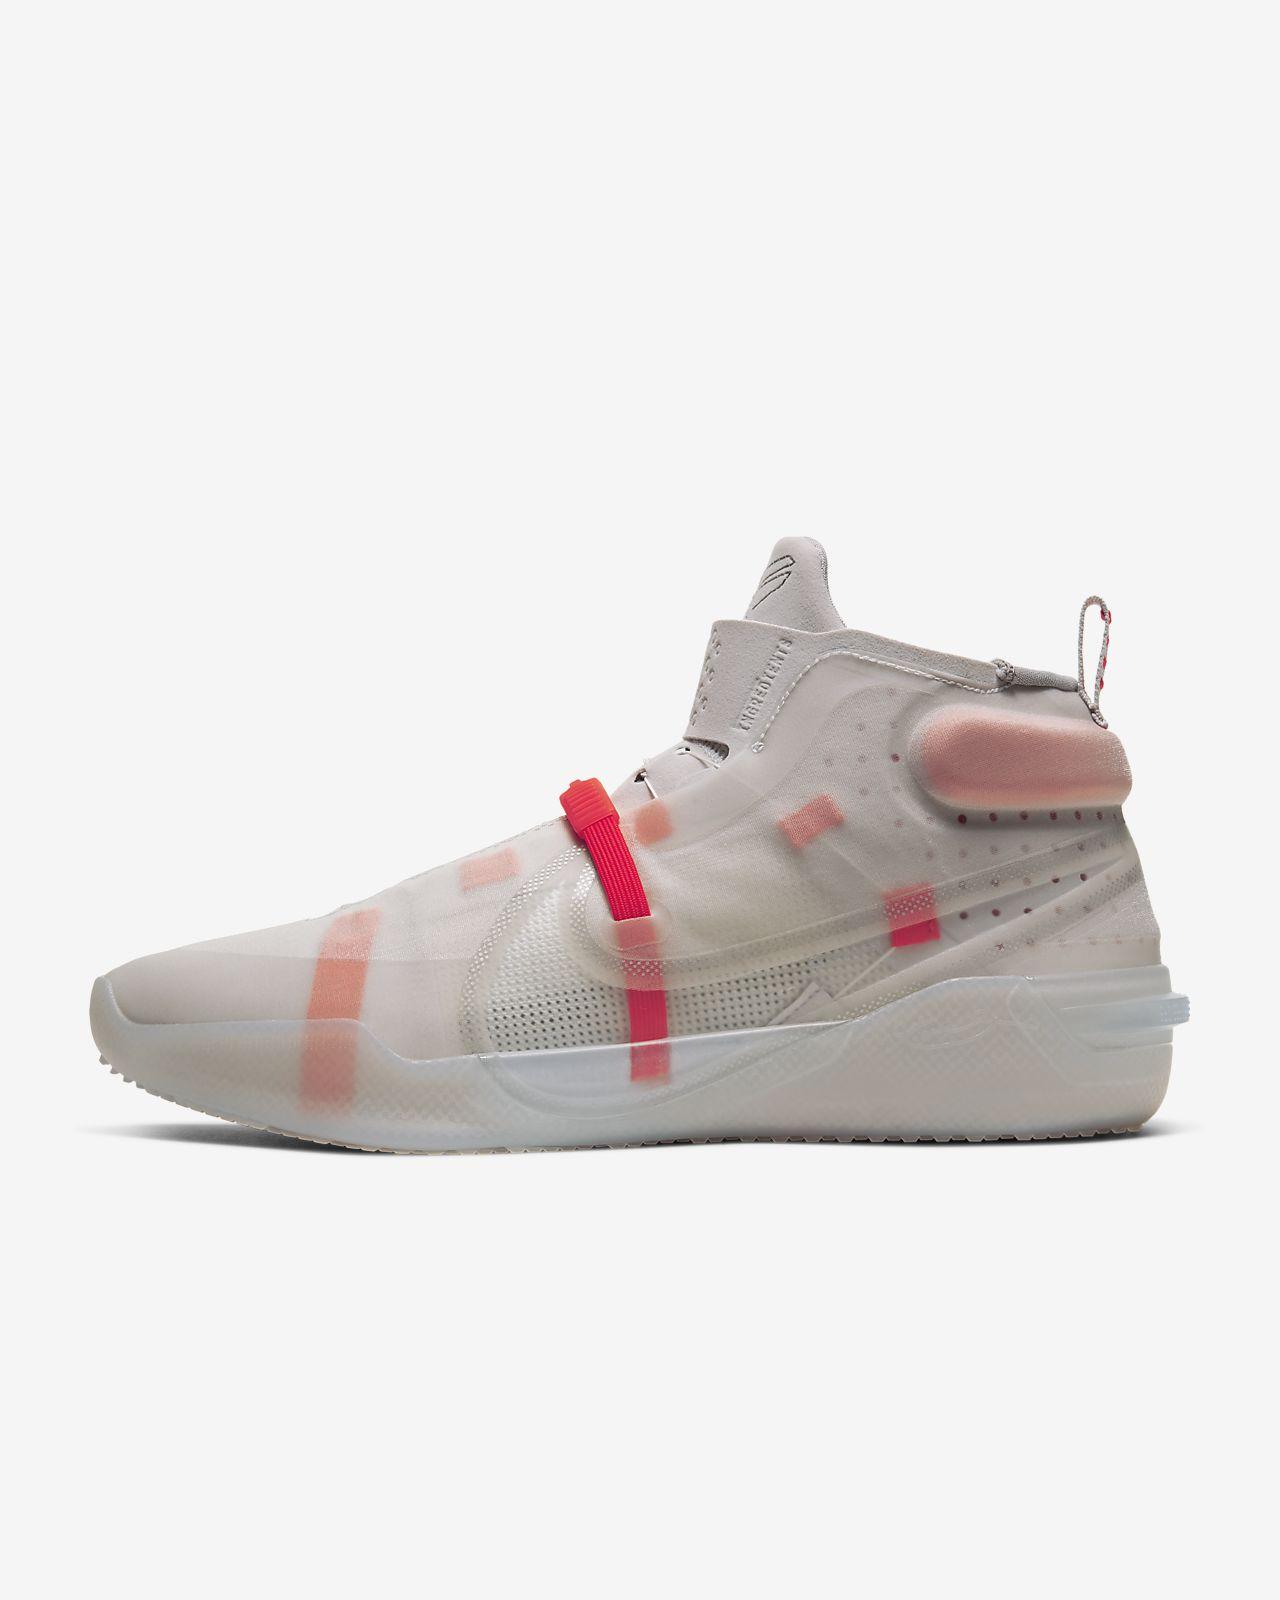 best sneakers a2d55 3e58b Kobe AD NXT Basketball Shoe